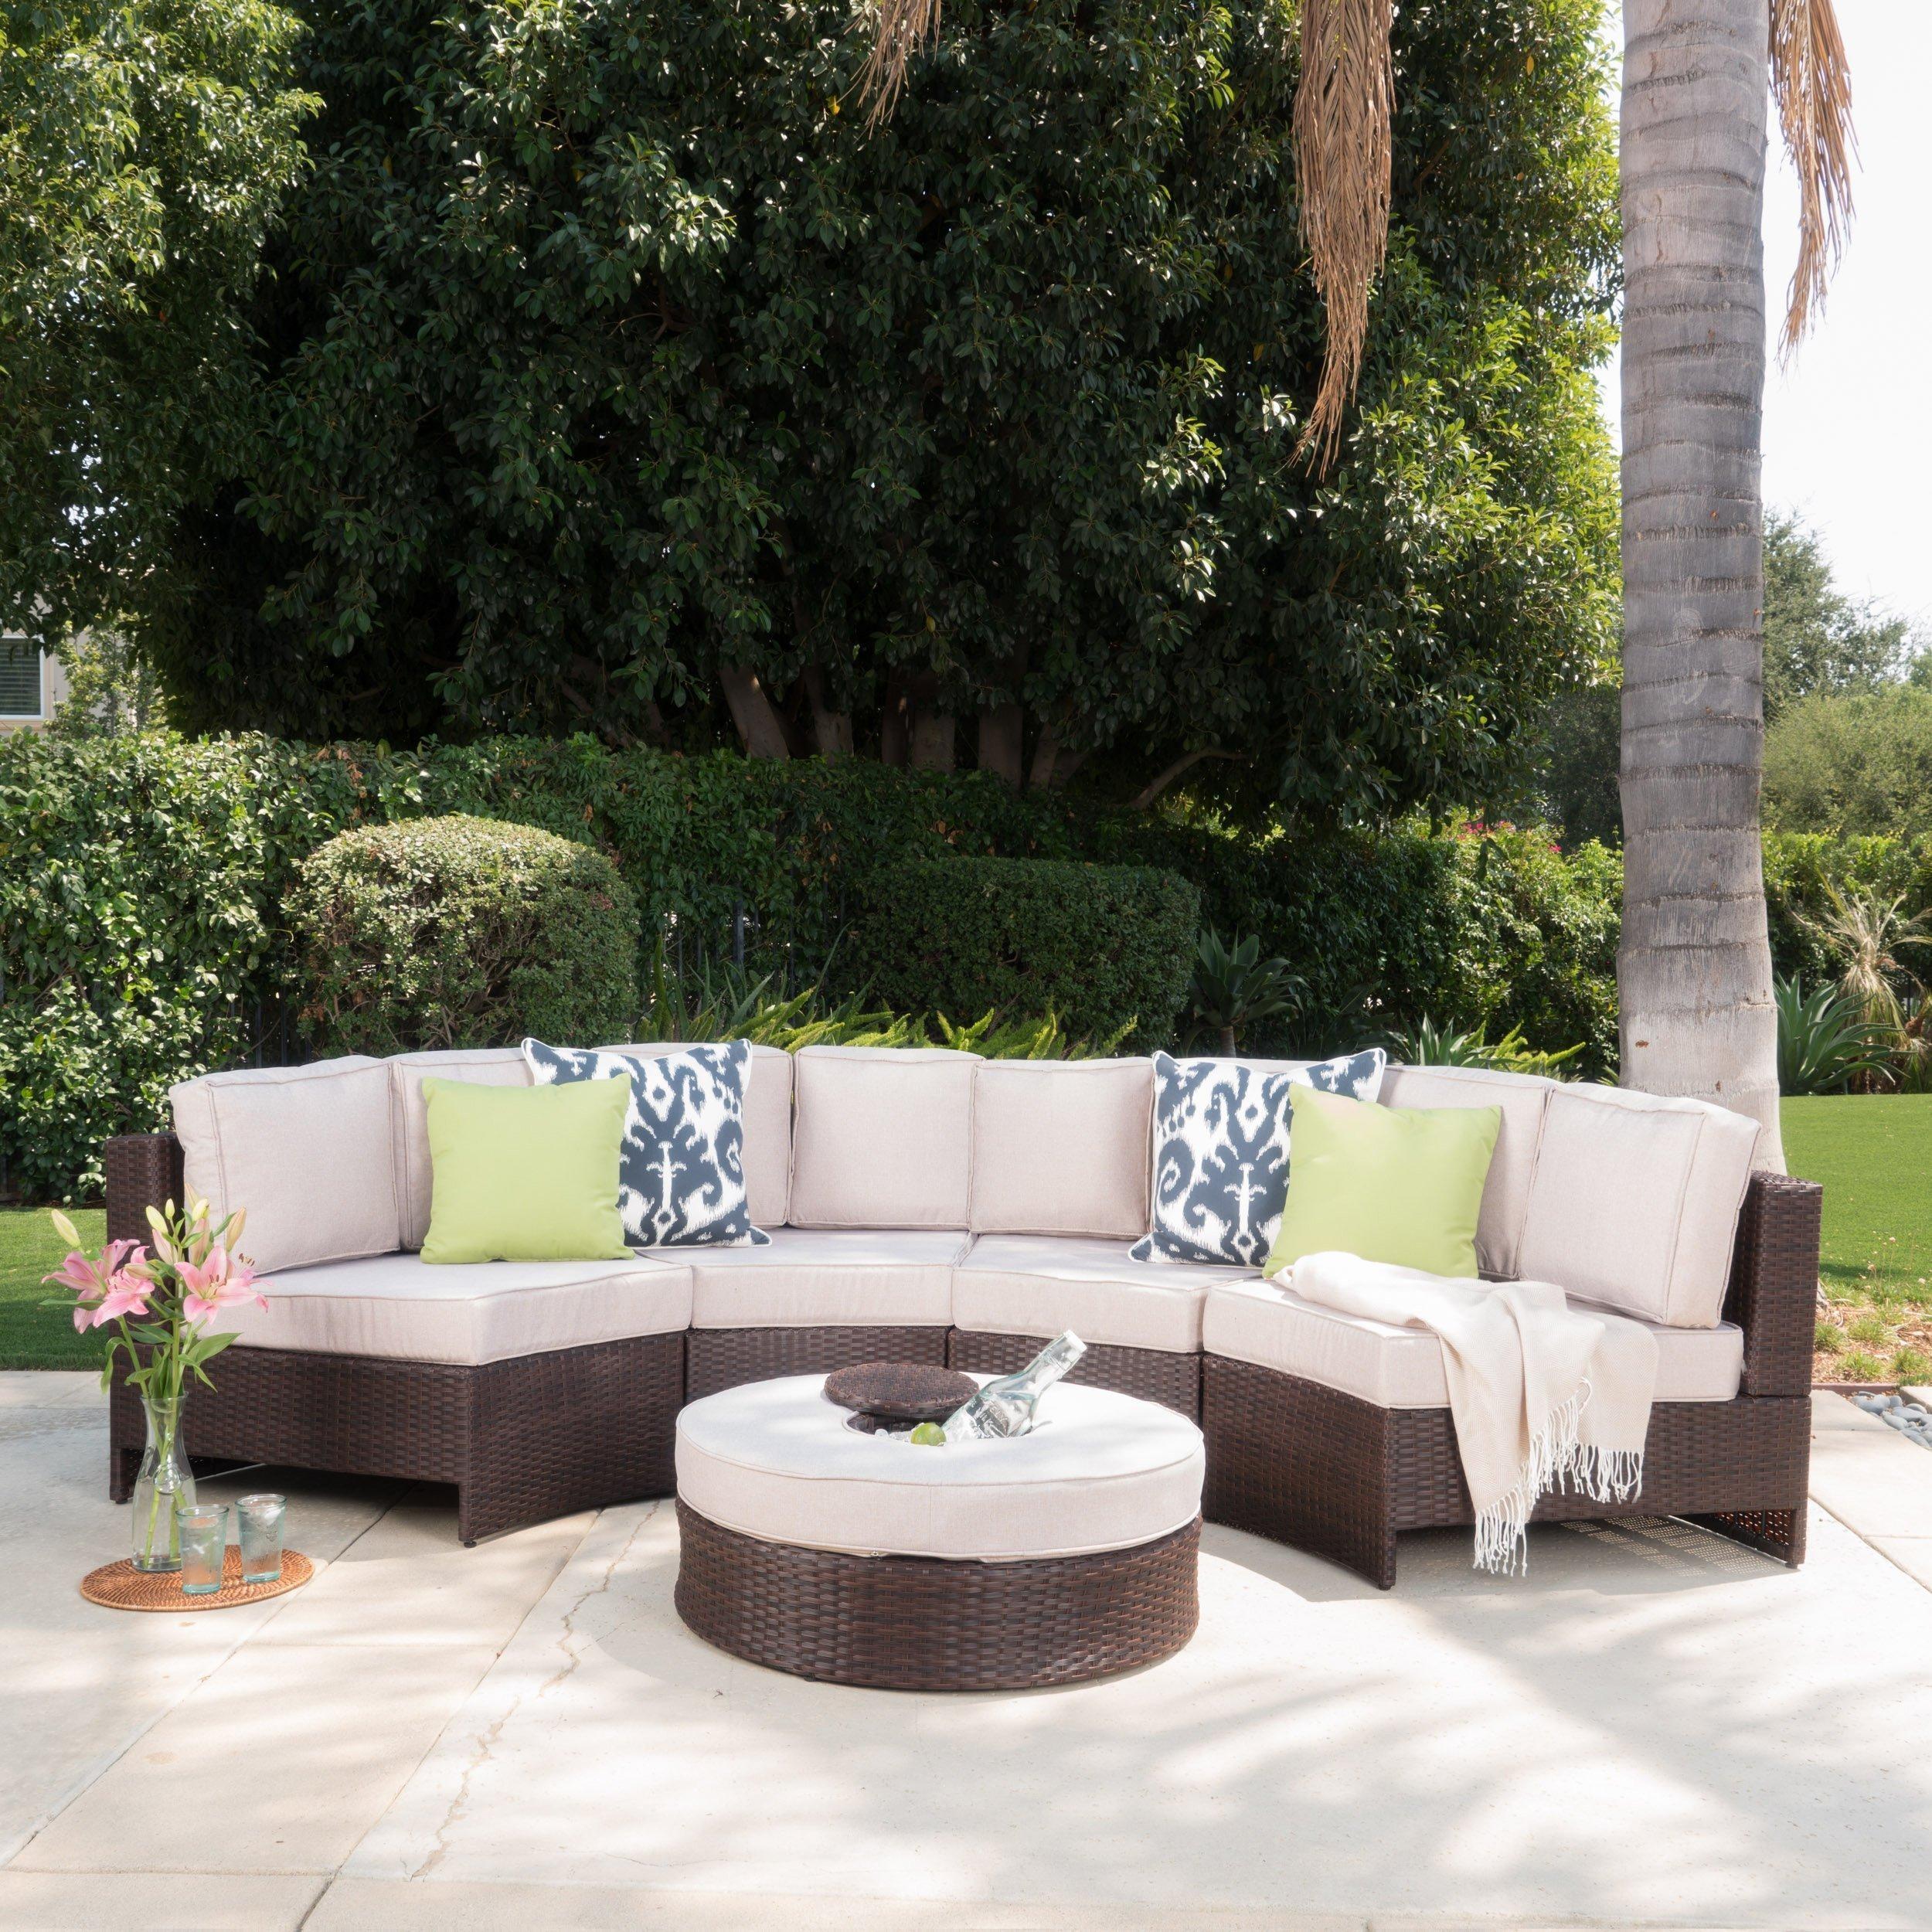 Online Patio Furniture Deals: Online Store: Riviera Ponza Outdoor Patio Furniture Wicker